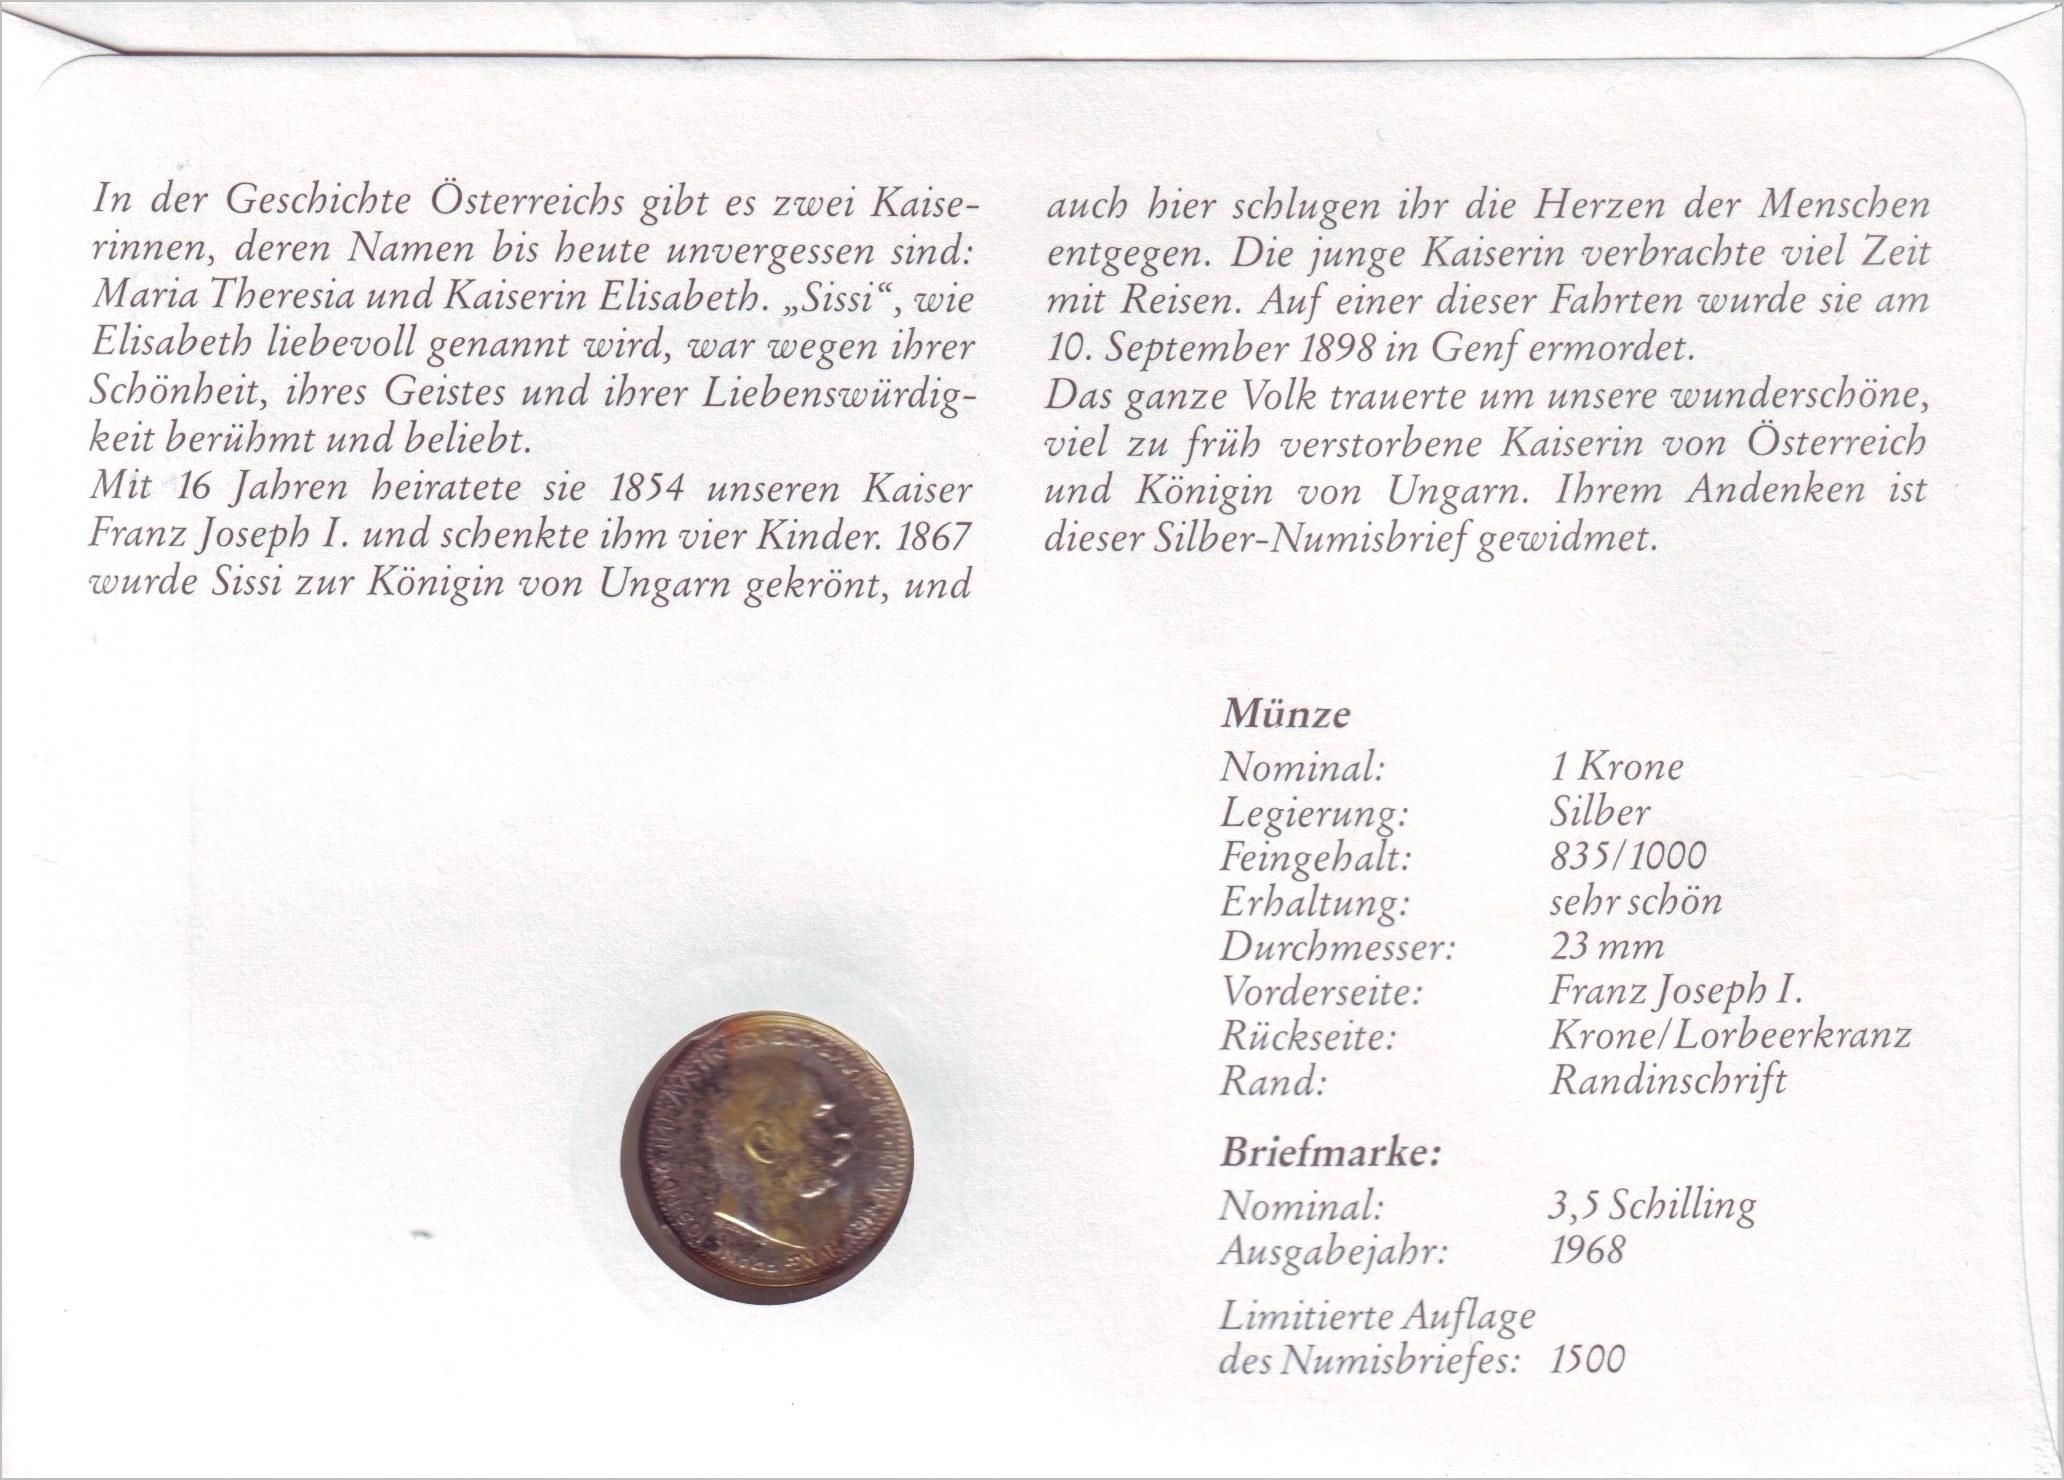 http://www.ermeskepeslap.hu/kulfoldikiadasu_magyarvonatkozasu_ermeskepeslapok/elisabeth_sissi_konigin_von_ungarn/www_ermeskepeslap_hu_elisabeth_sissi_konigin_von_ungarn_hatoldal_nagy.jpg